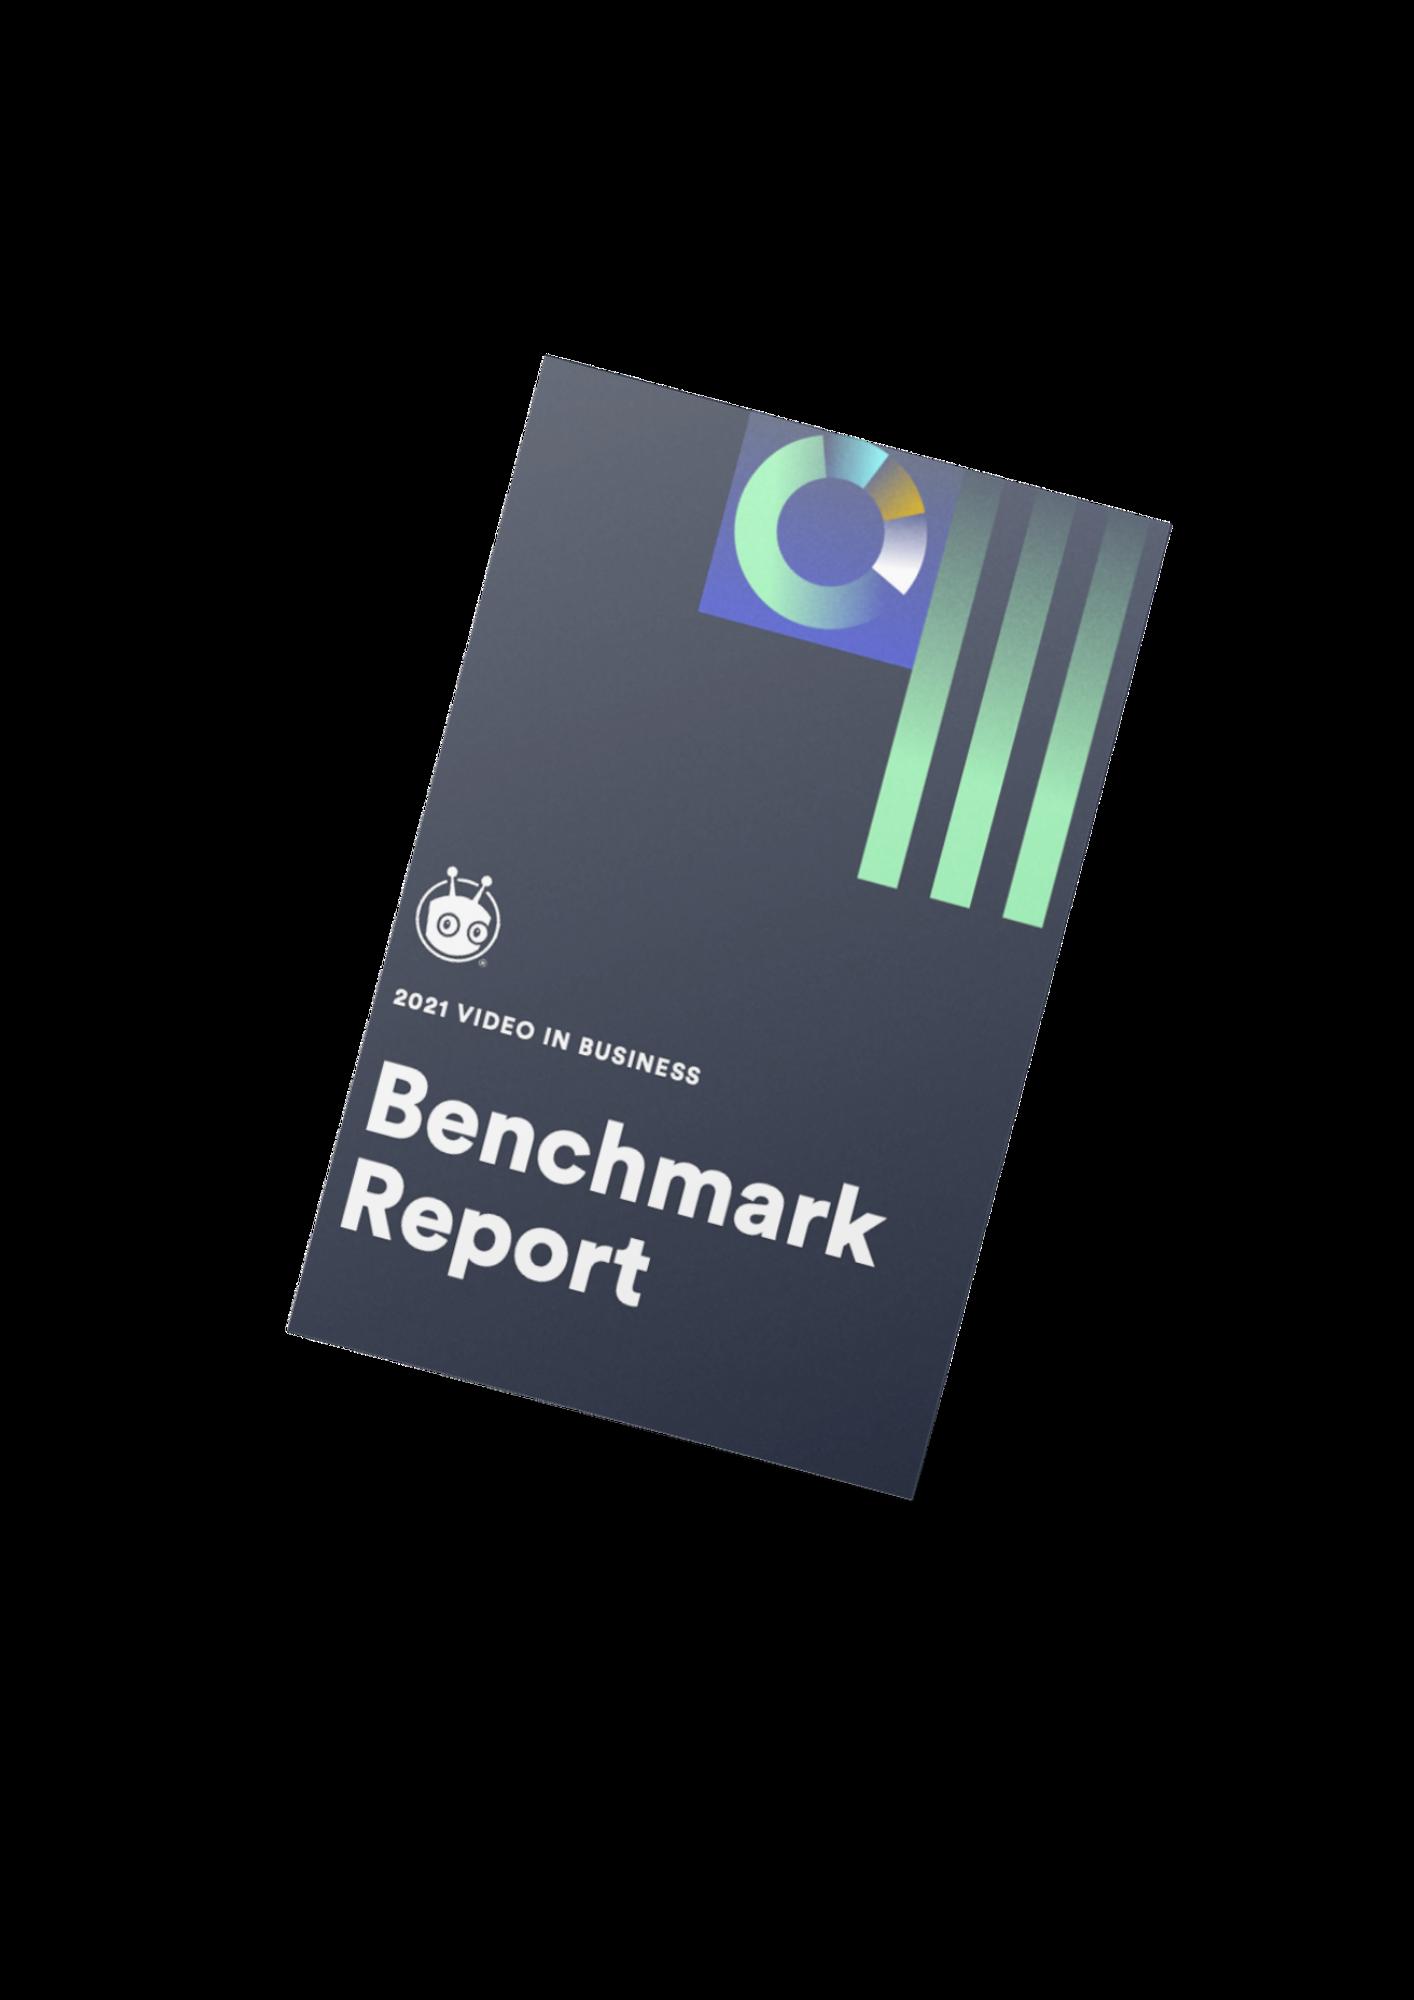 Benchmark Report 2021 Video in Business V2